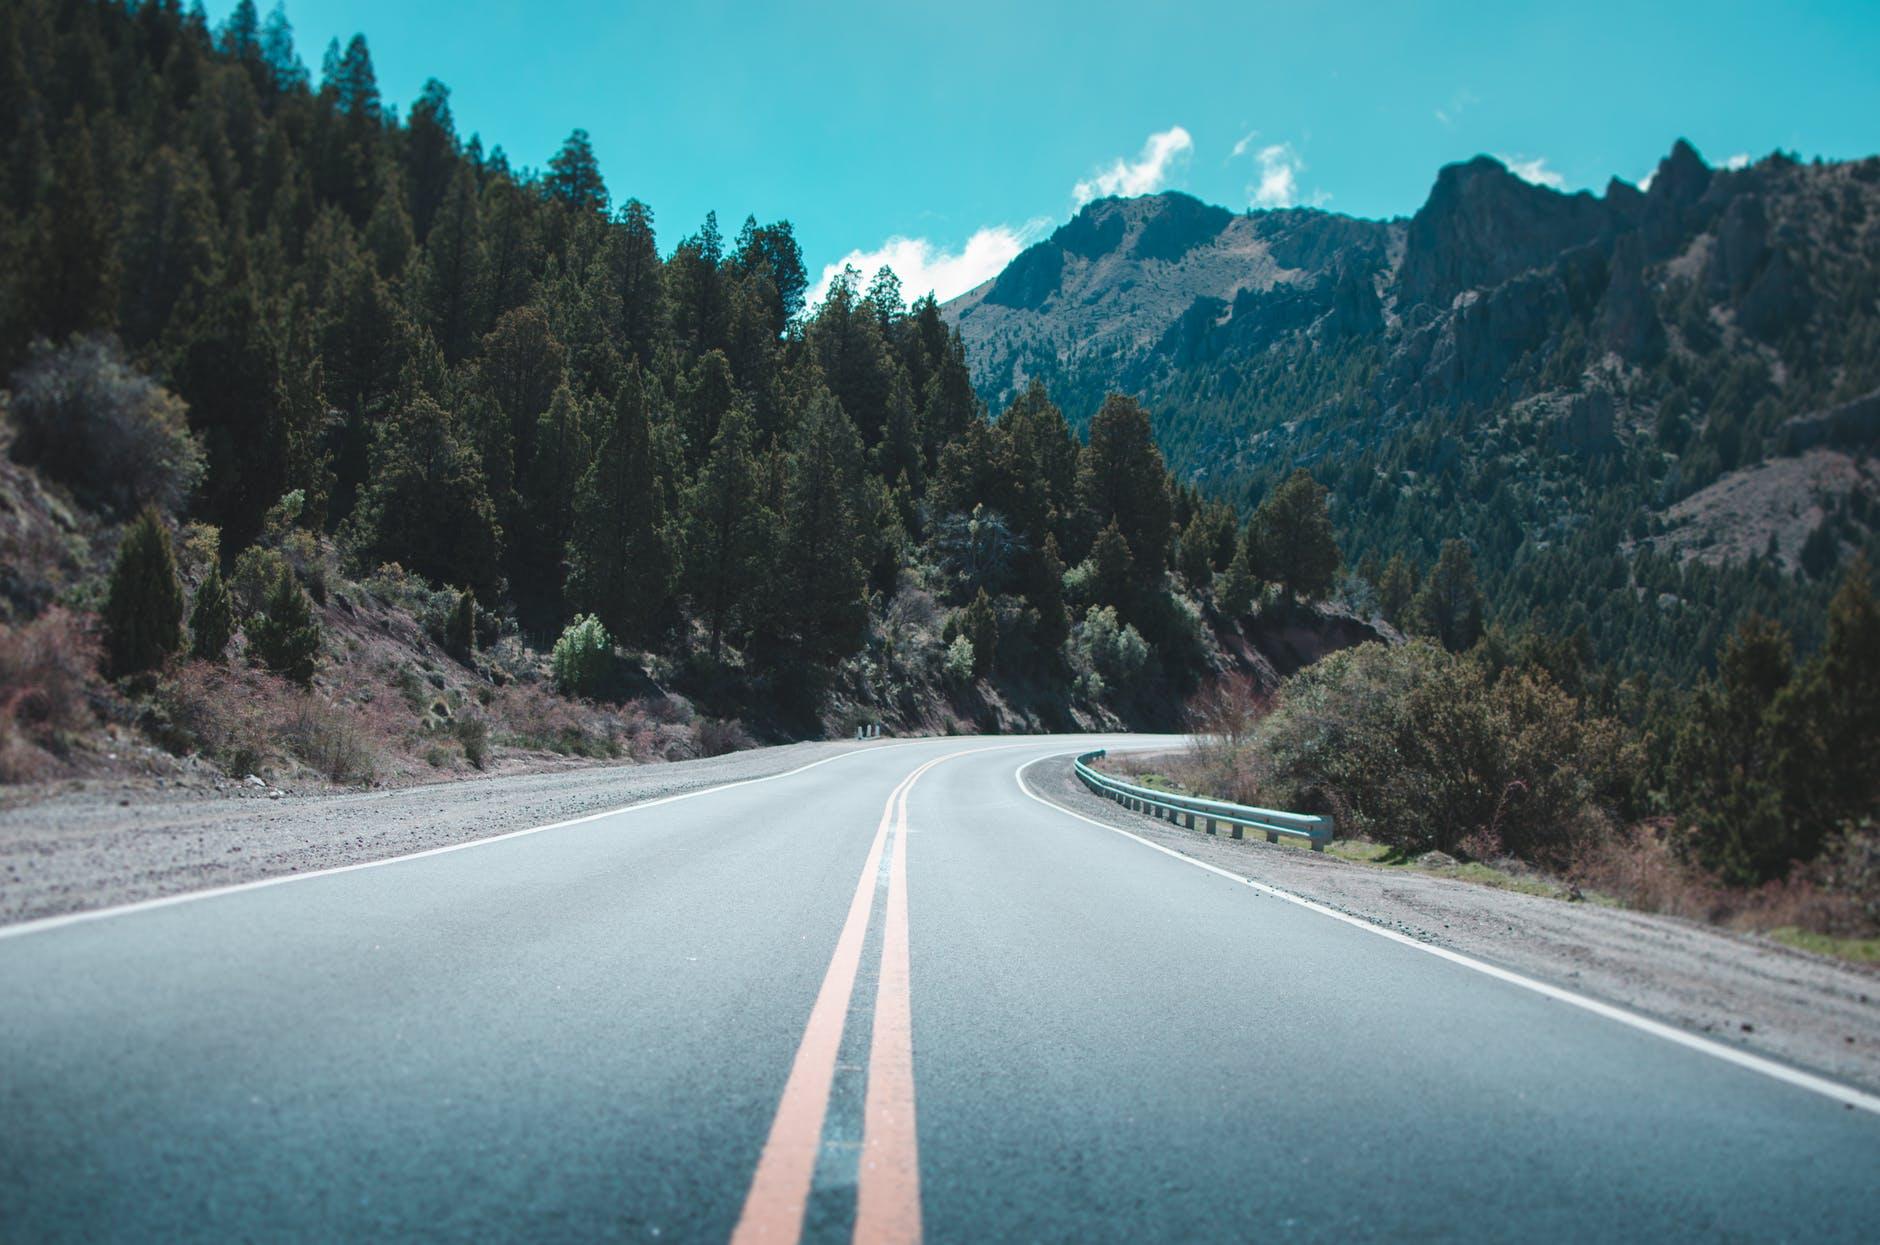 Take a road trip to the Gamma Distribution